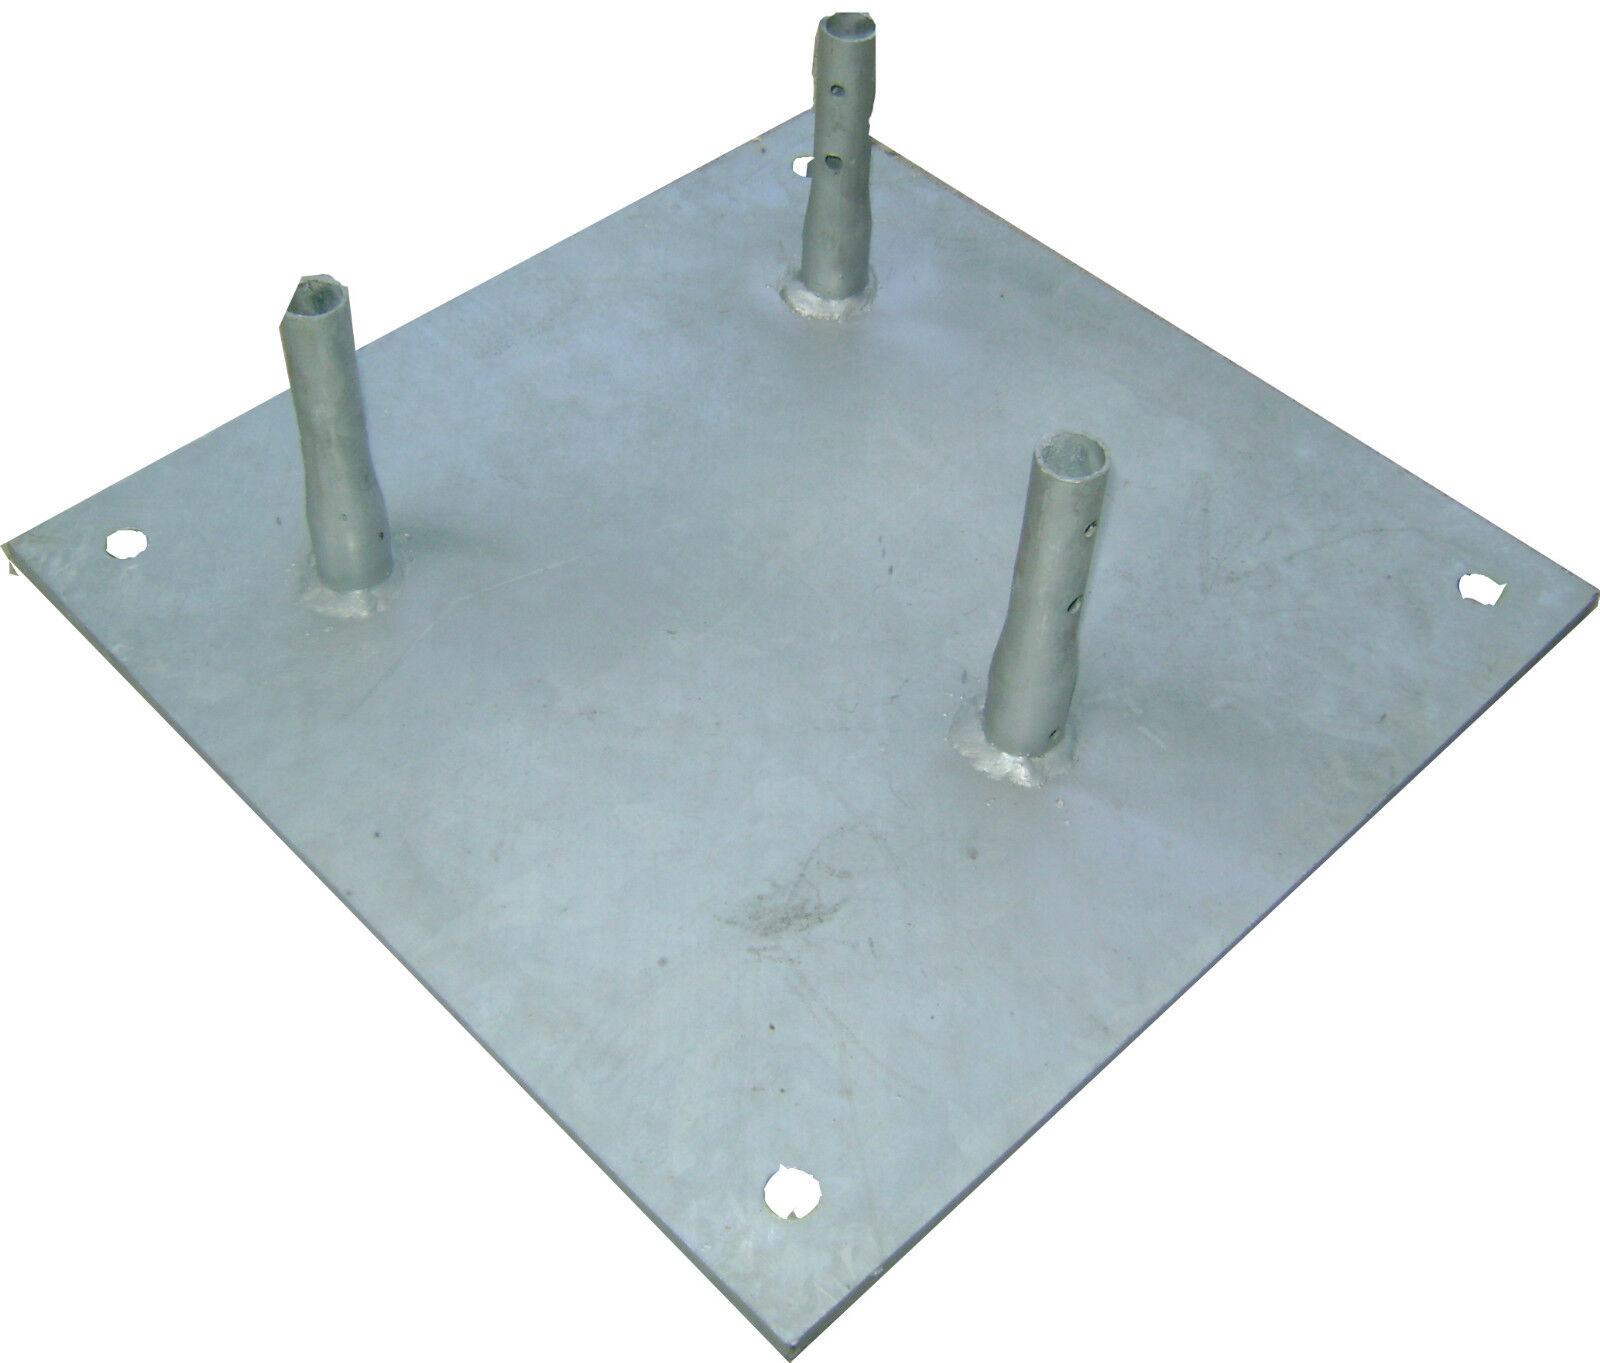 R-25GSSB antennapartsoutlet1 ROHN 25GSSB Self Supporting Base Plate for ROHN 25G Tower - R-25GSSB Genuine OEM